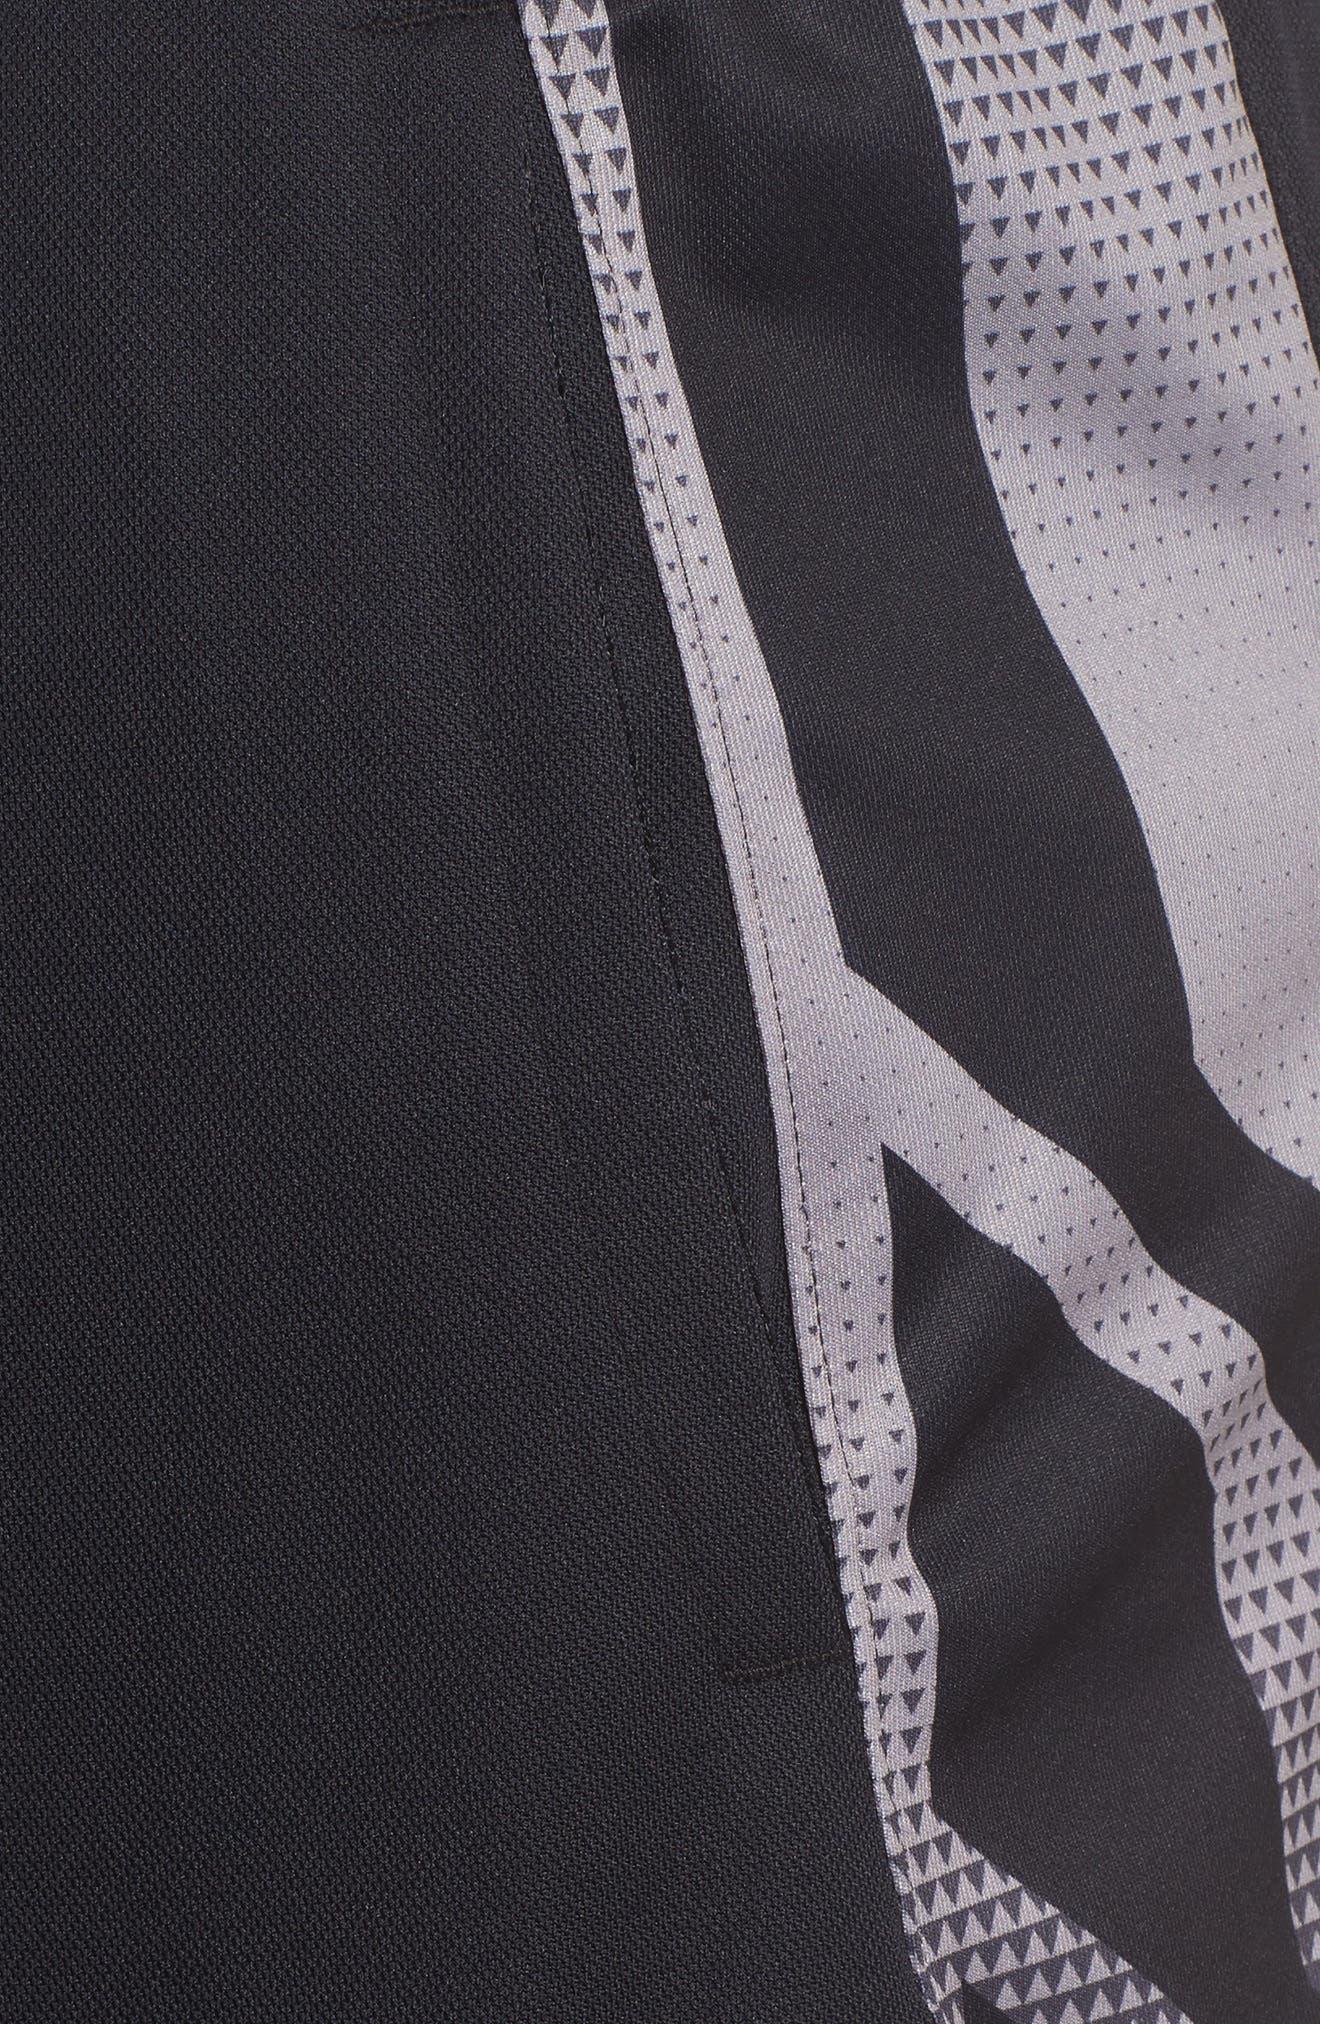 Select Basketball Shorts,                             Alternate thumbnail 4, color,                             001